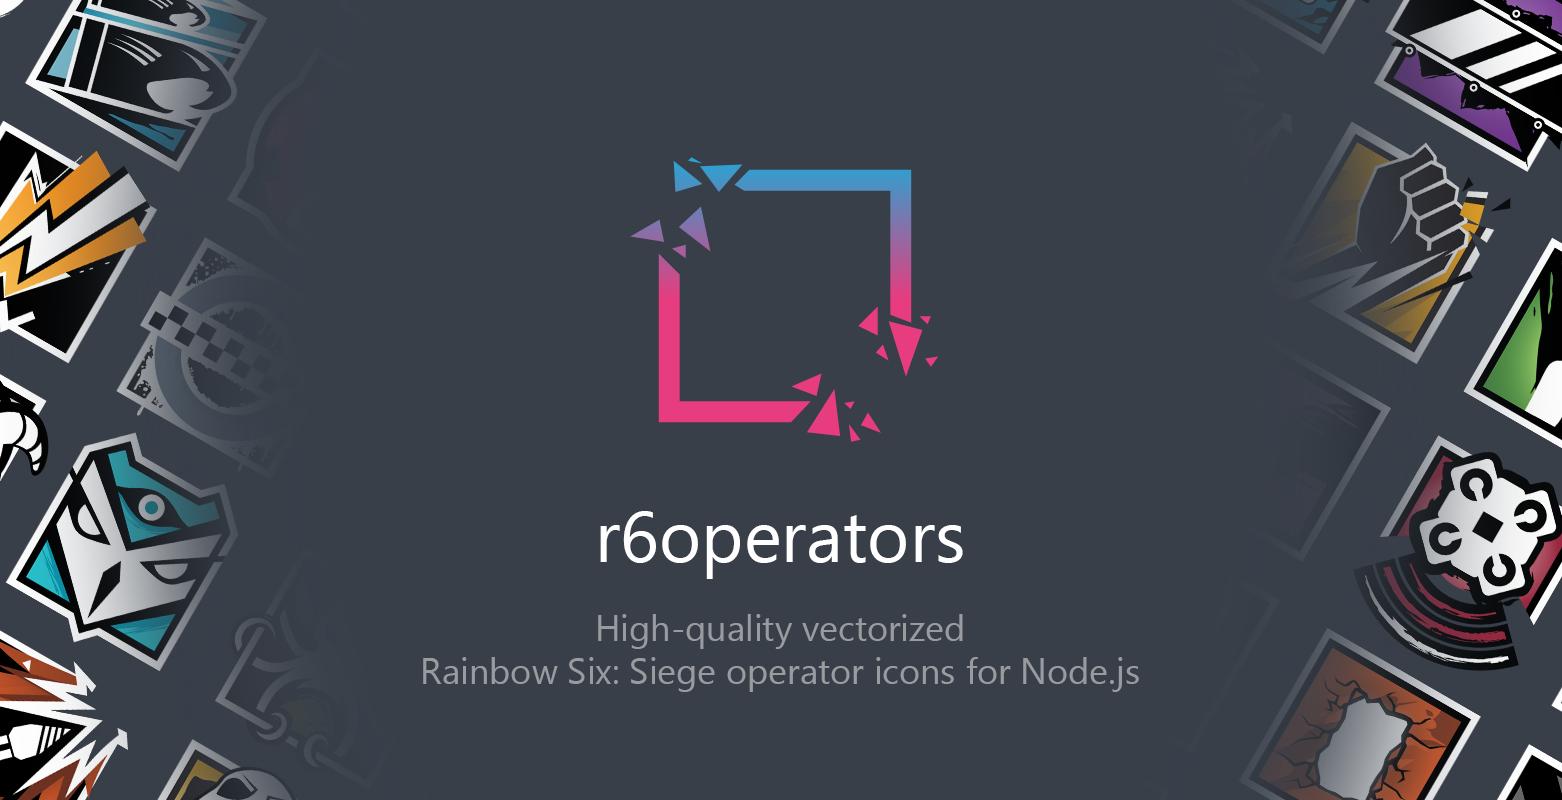 r6operators Header Image